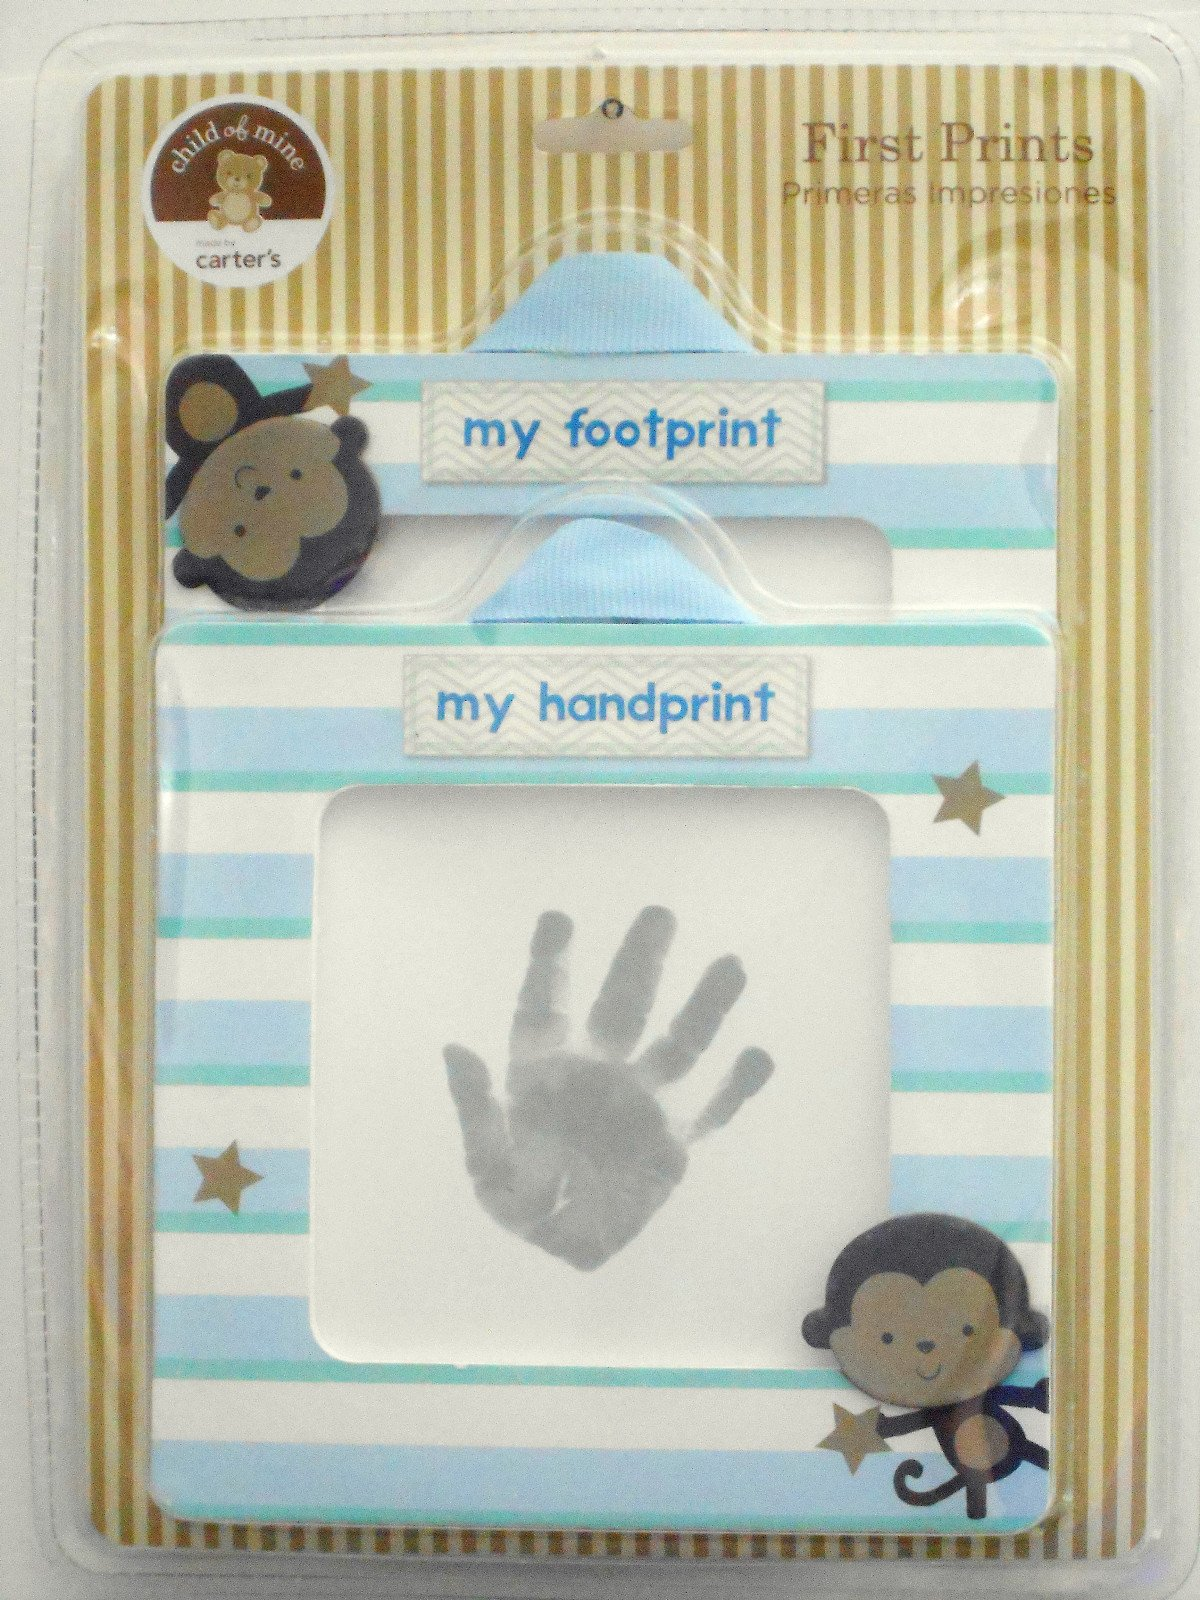 Carter's Child of Mine Baby Boy First Handprint and Footprint Kit, Monkey, stripe Frames